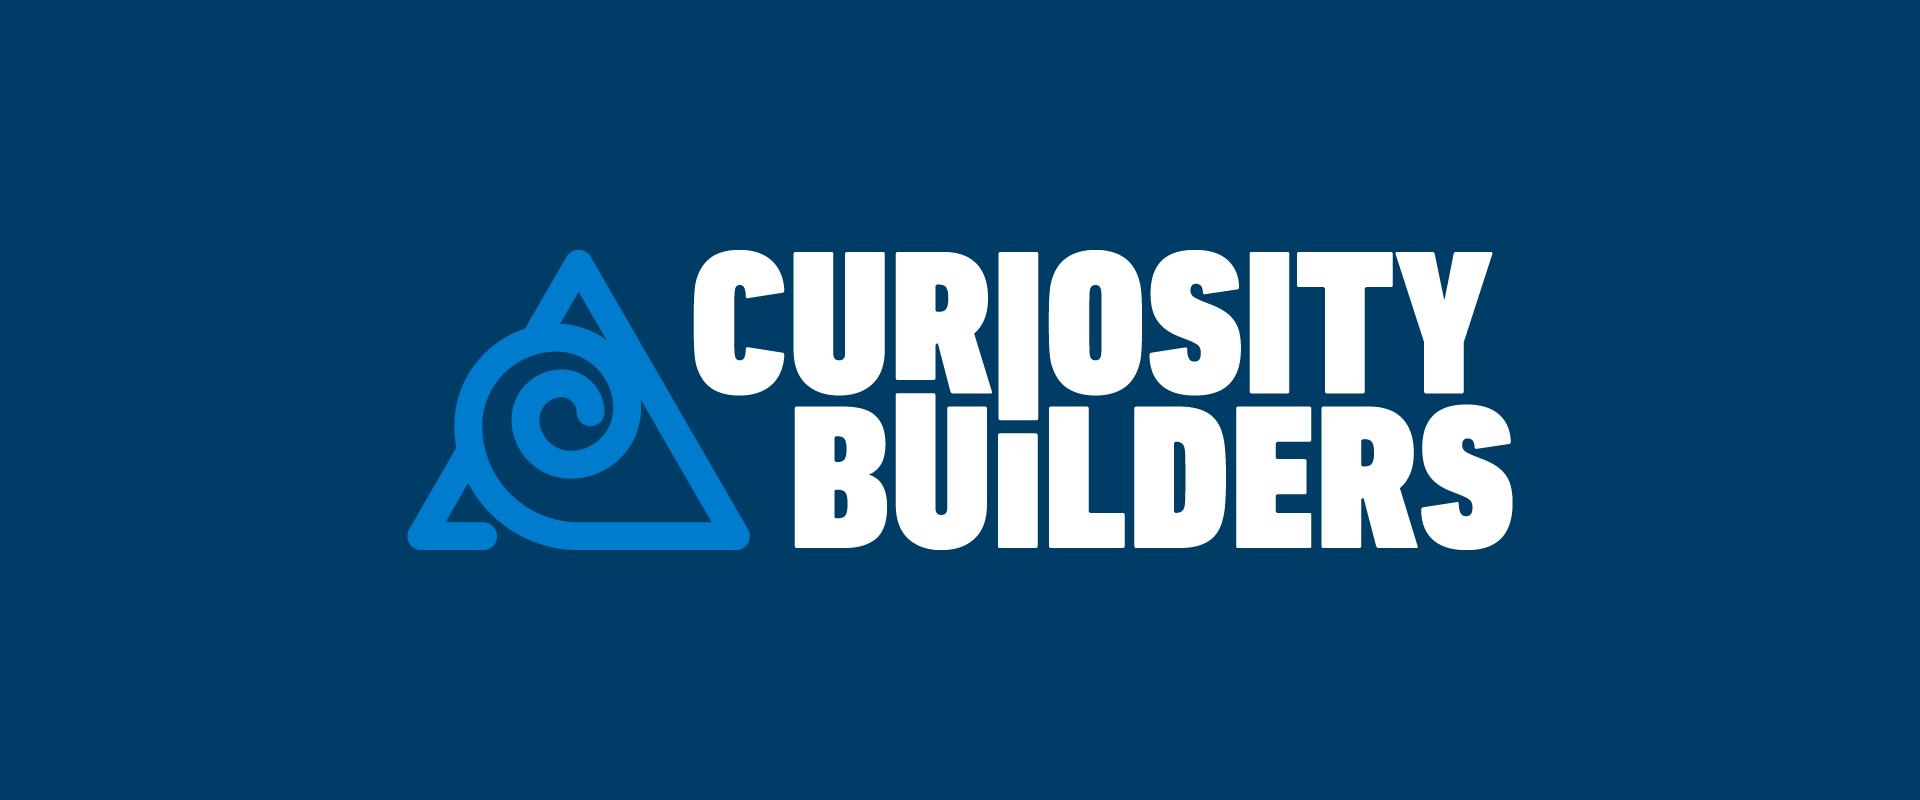 Curiosity Builders